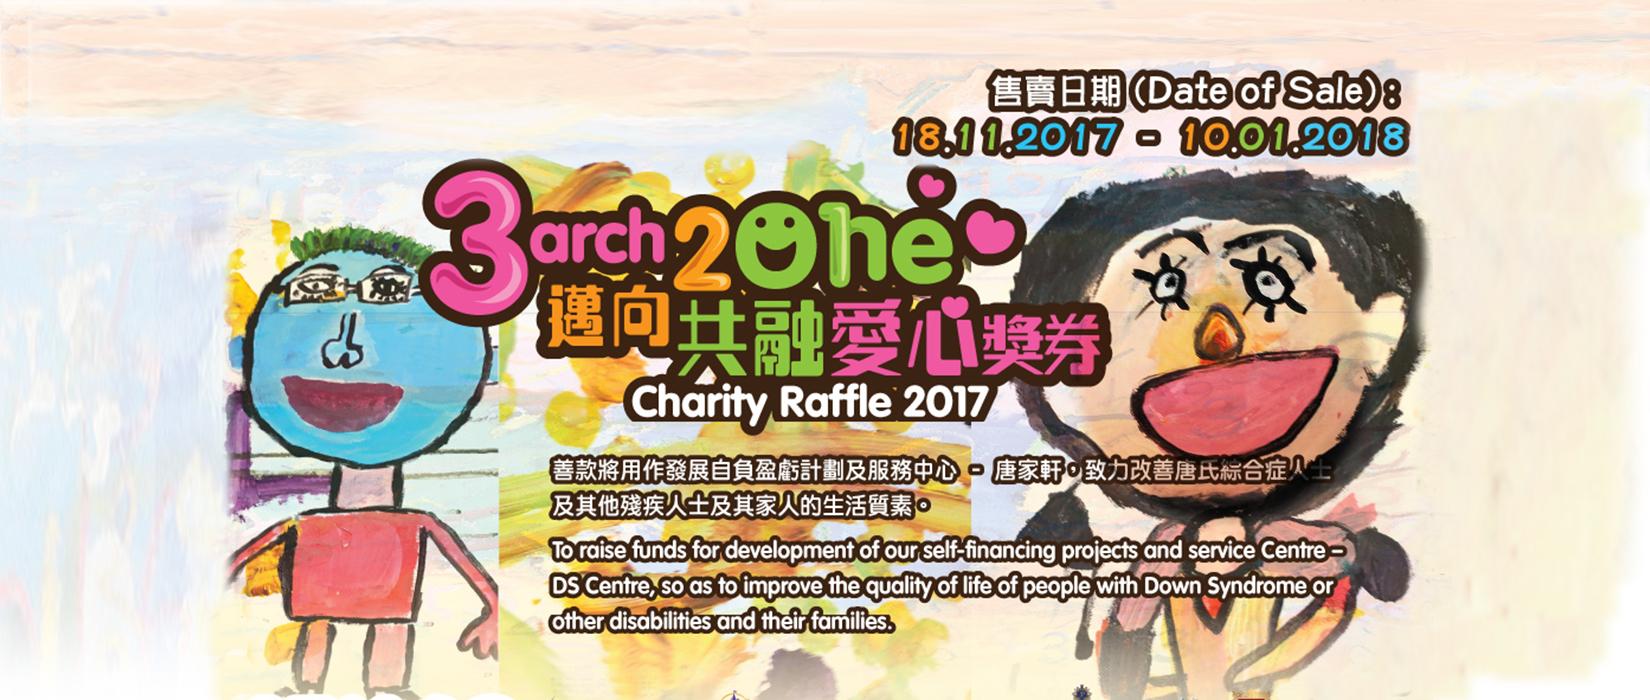 raffle-ticket-homepage-banner-v2-1